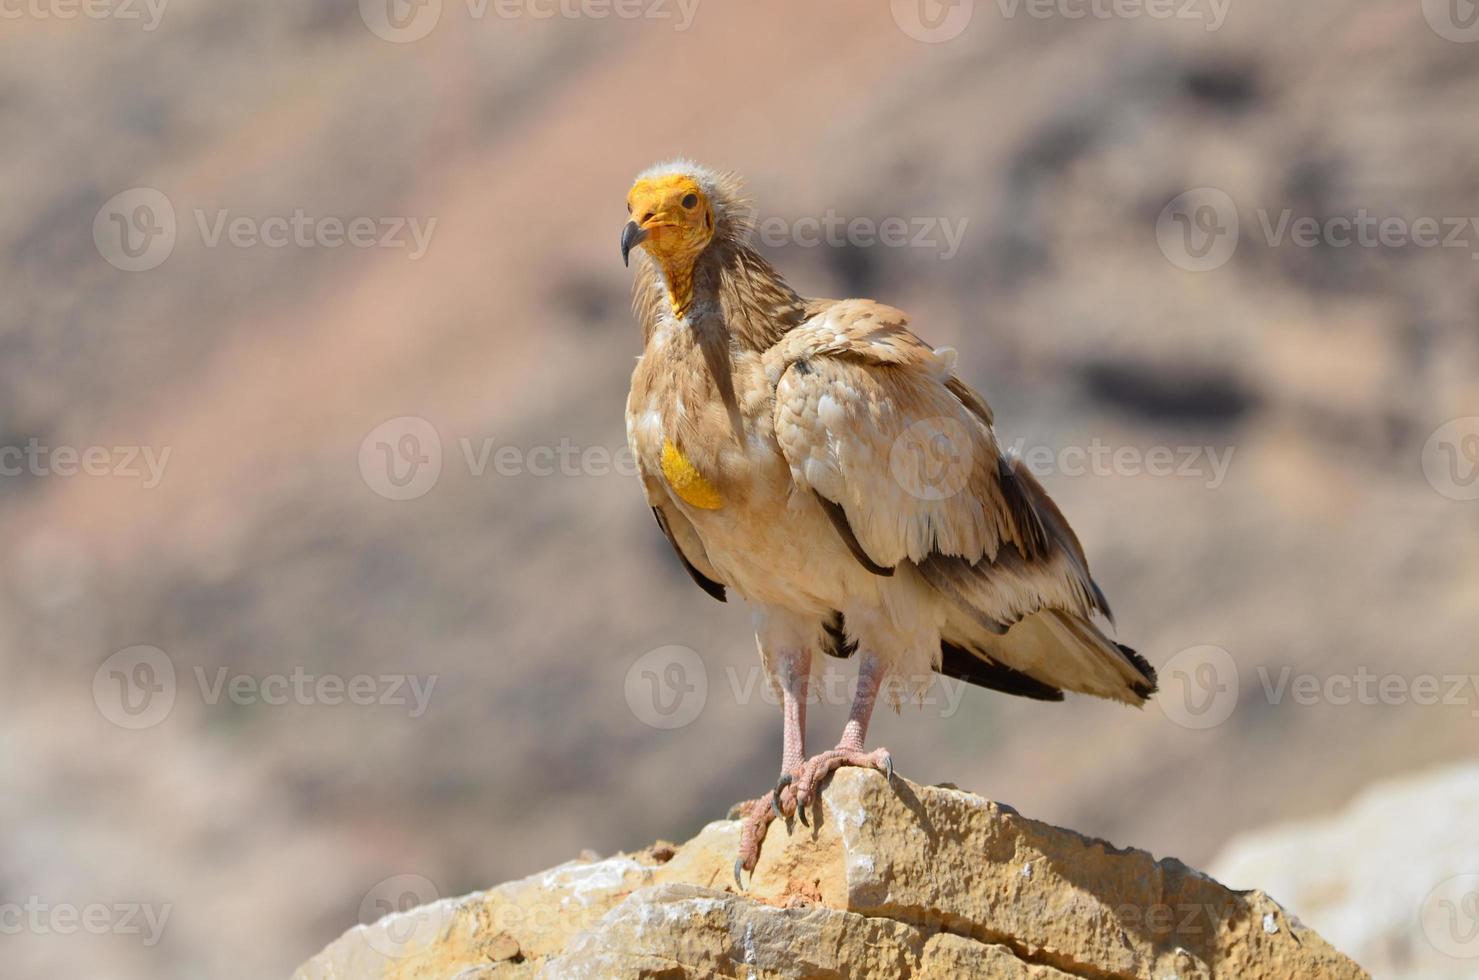 abutres egípcios (neophron percnopterus) sentam-se nas rochas foto